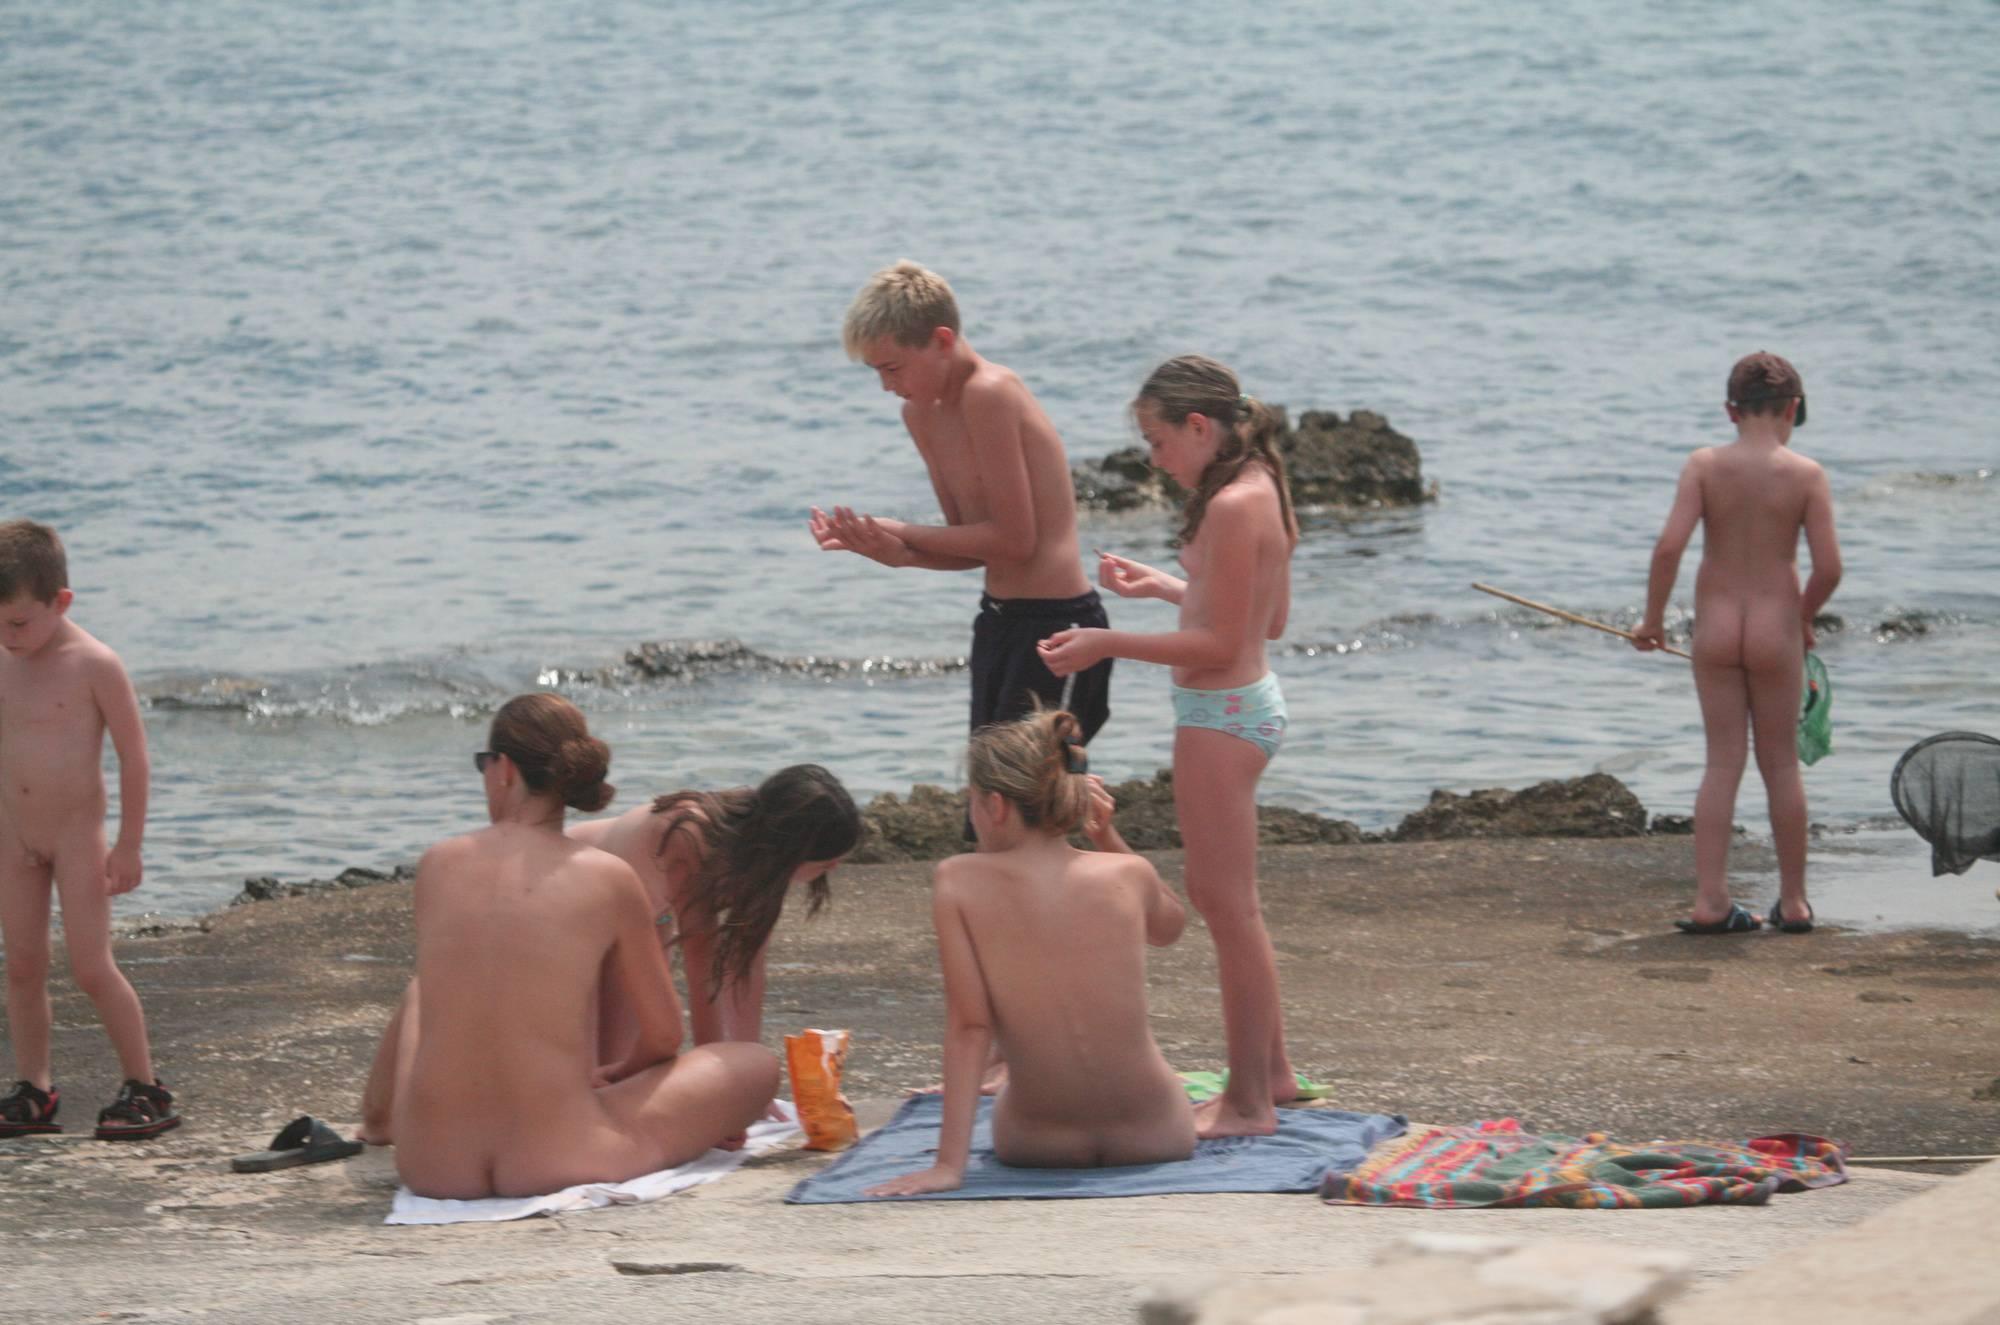 Nude FKK Family Beach - 1